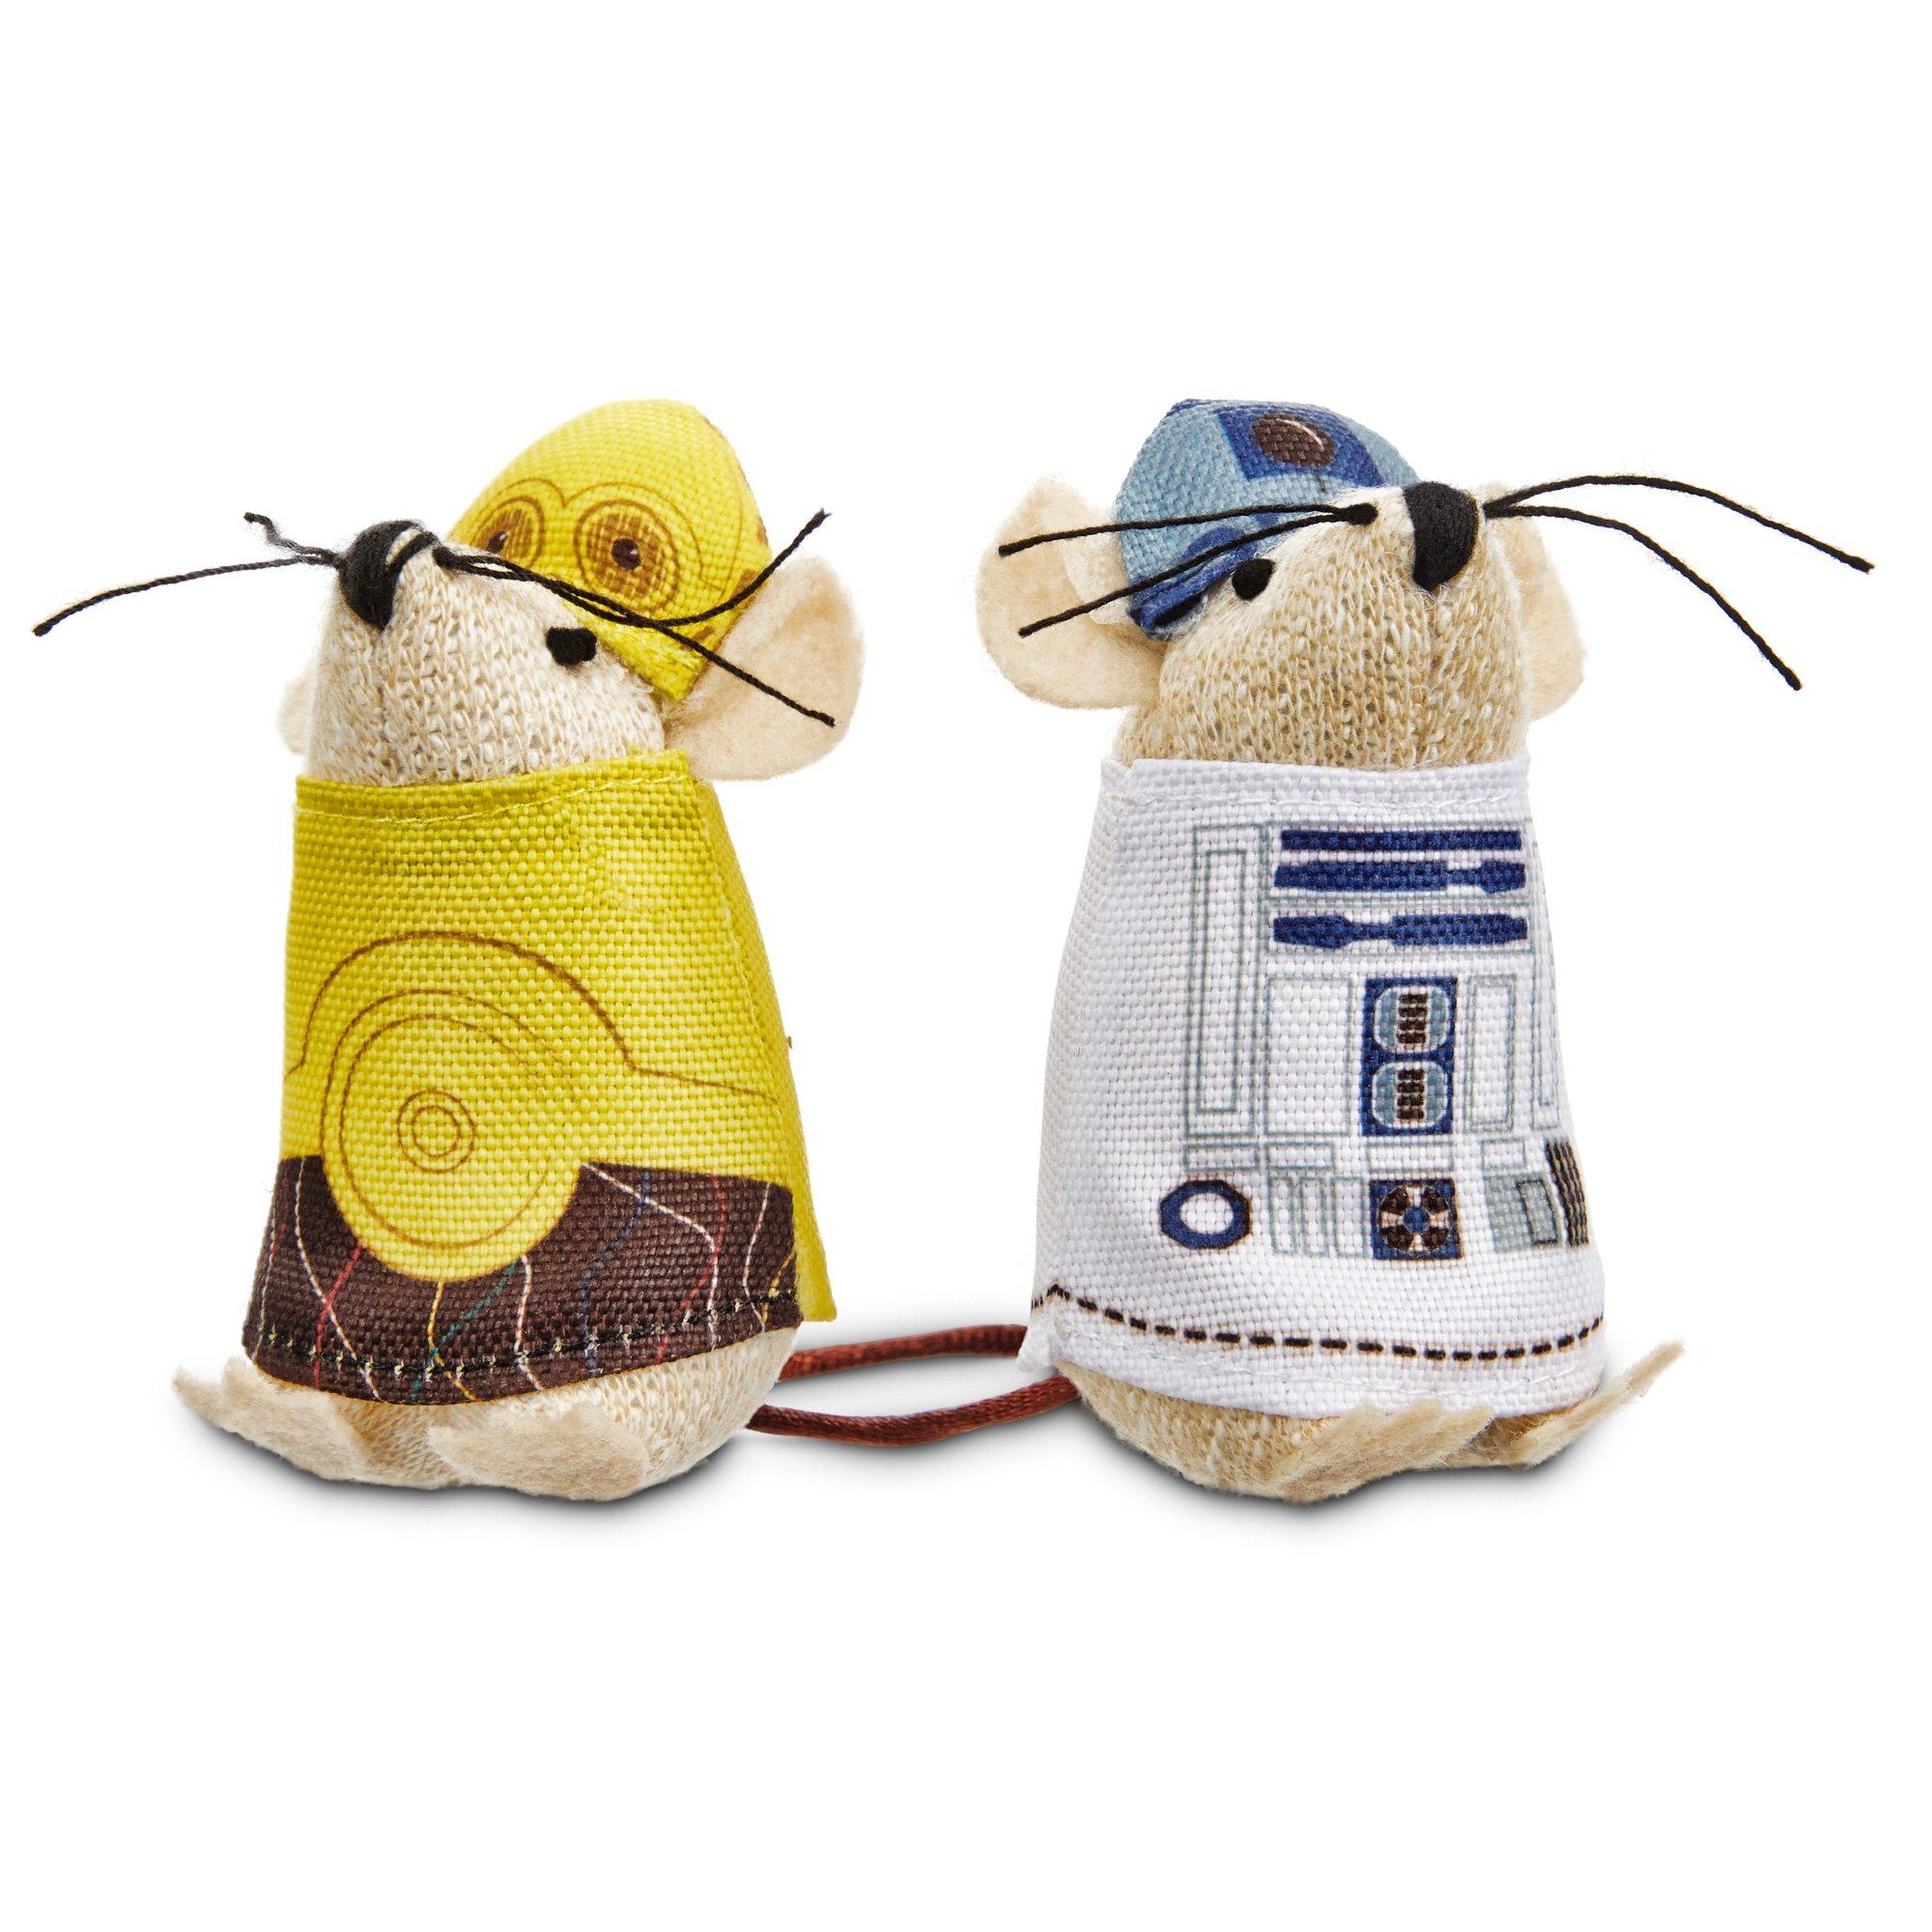 STAR WARS C-3PO & R2-D2 Mice Cat Toys